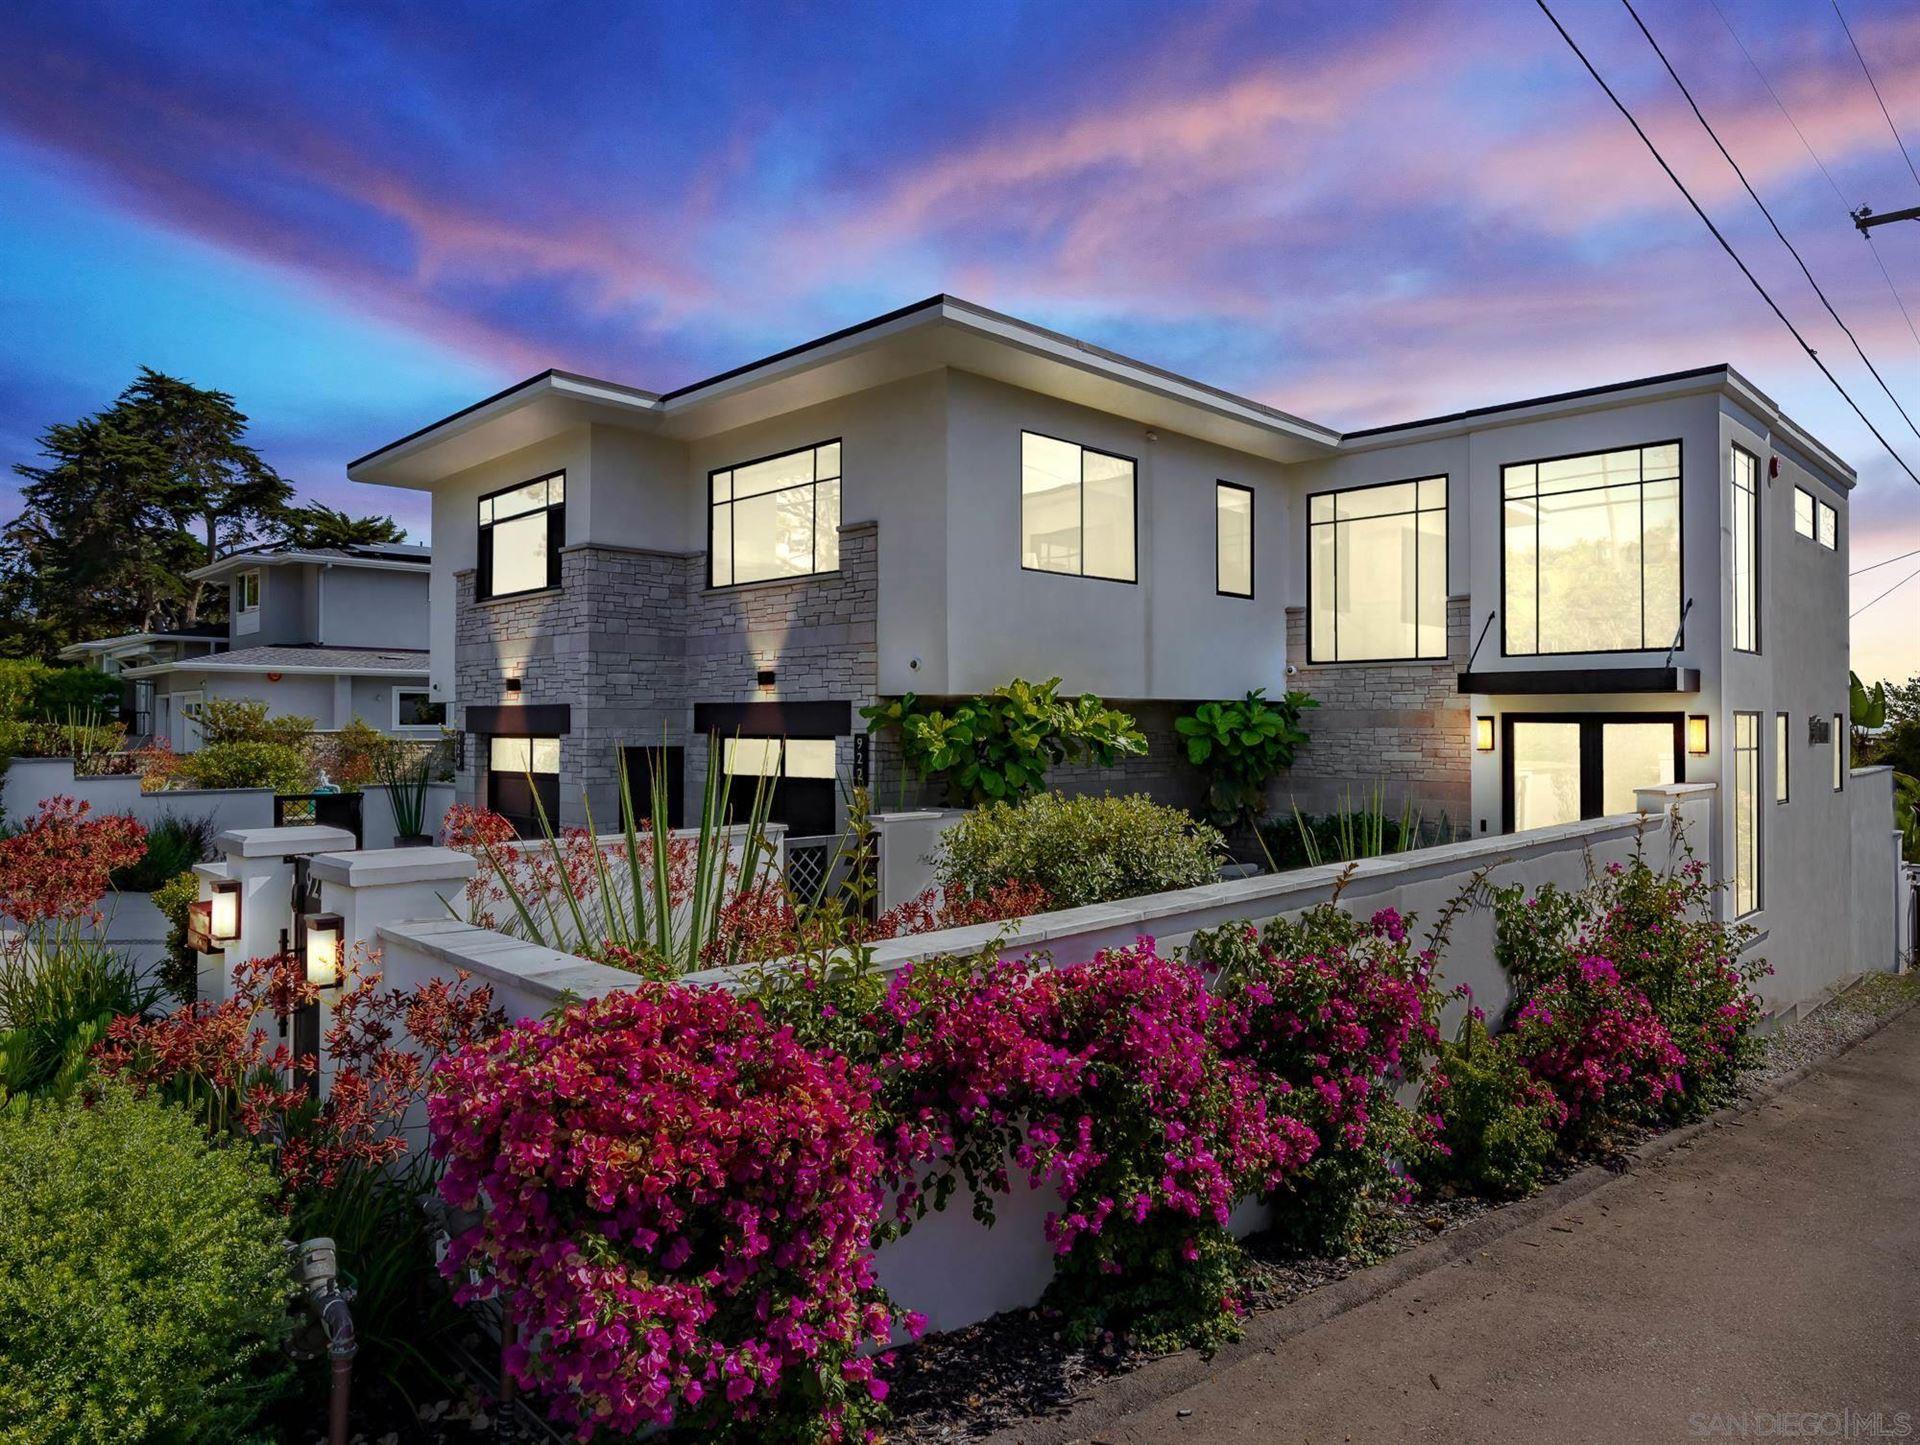 Photo of 922 Stratford Ct, Del Mar, CA 92014 (MLS # 210014069)